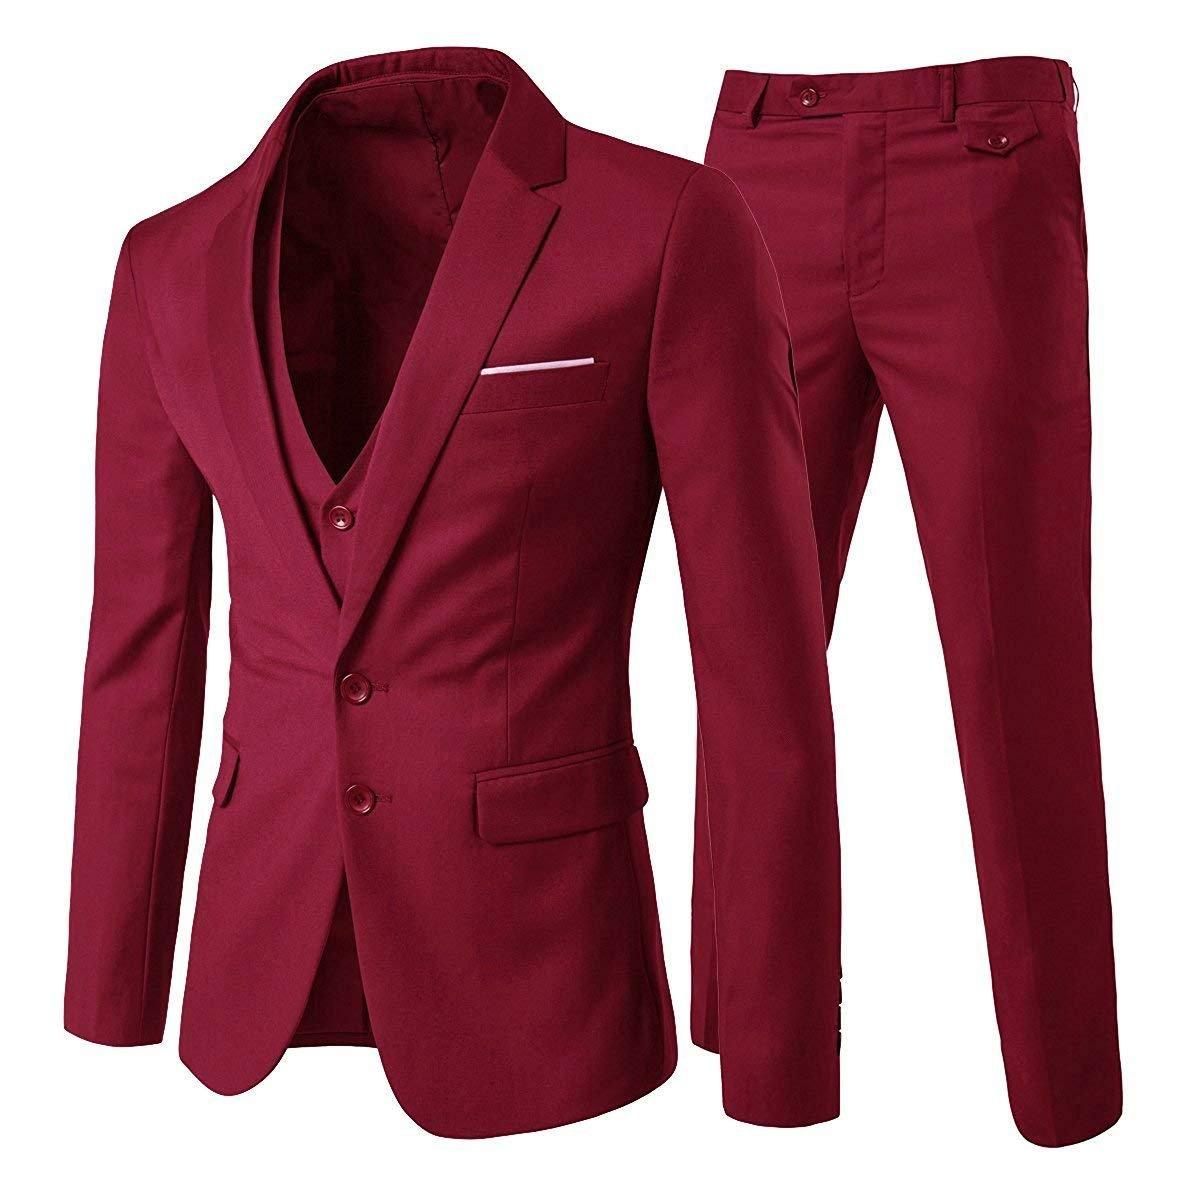 Cloudstyle Men's 3-Piece Suit 2 Buttons Slim Fit Solid Color Jacket Smart Wedding Formal Suit (XX-Large, Red)